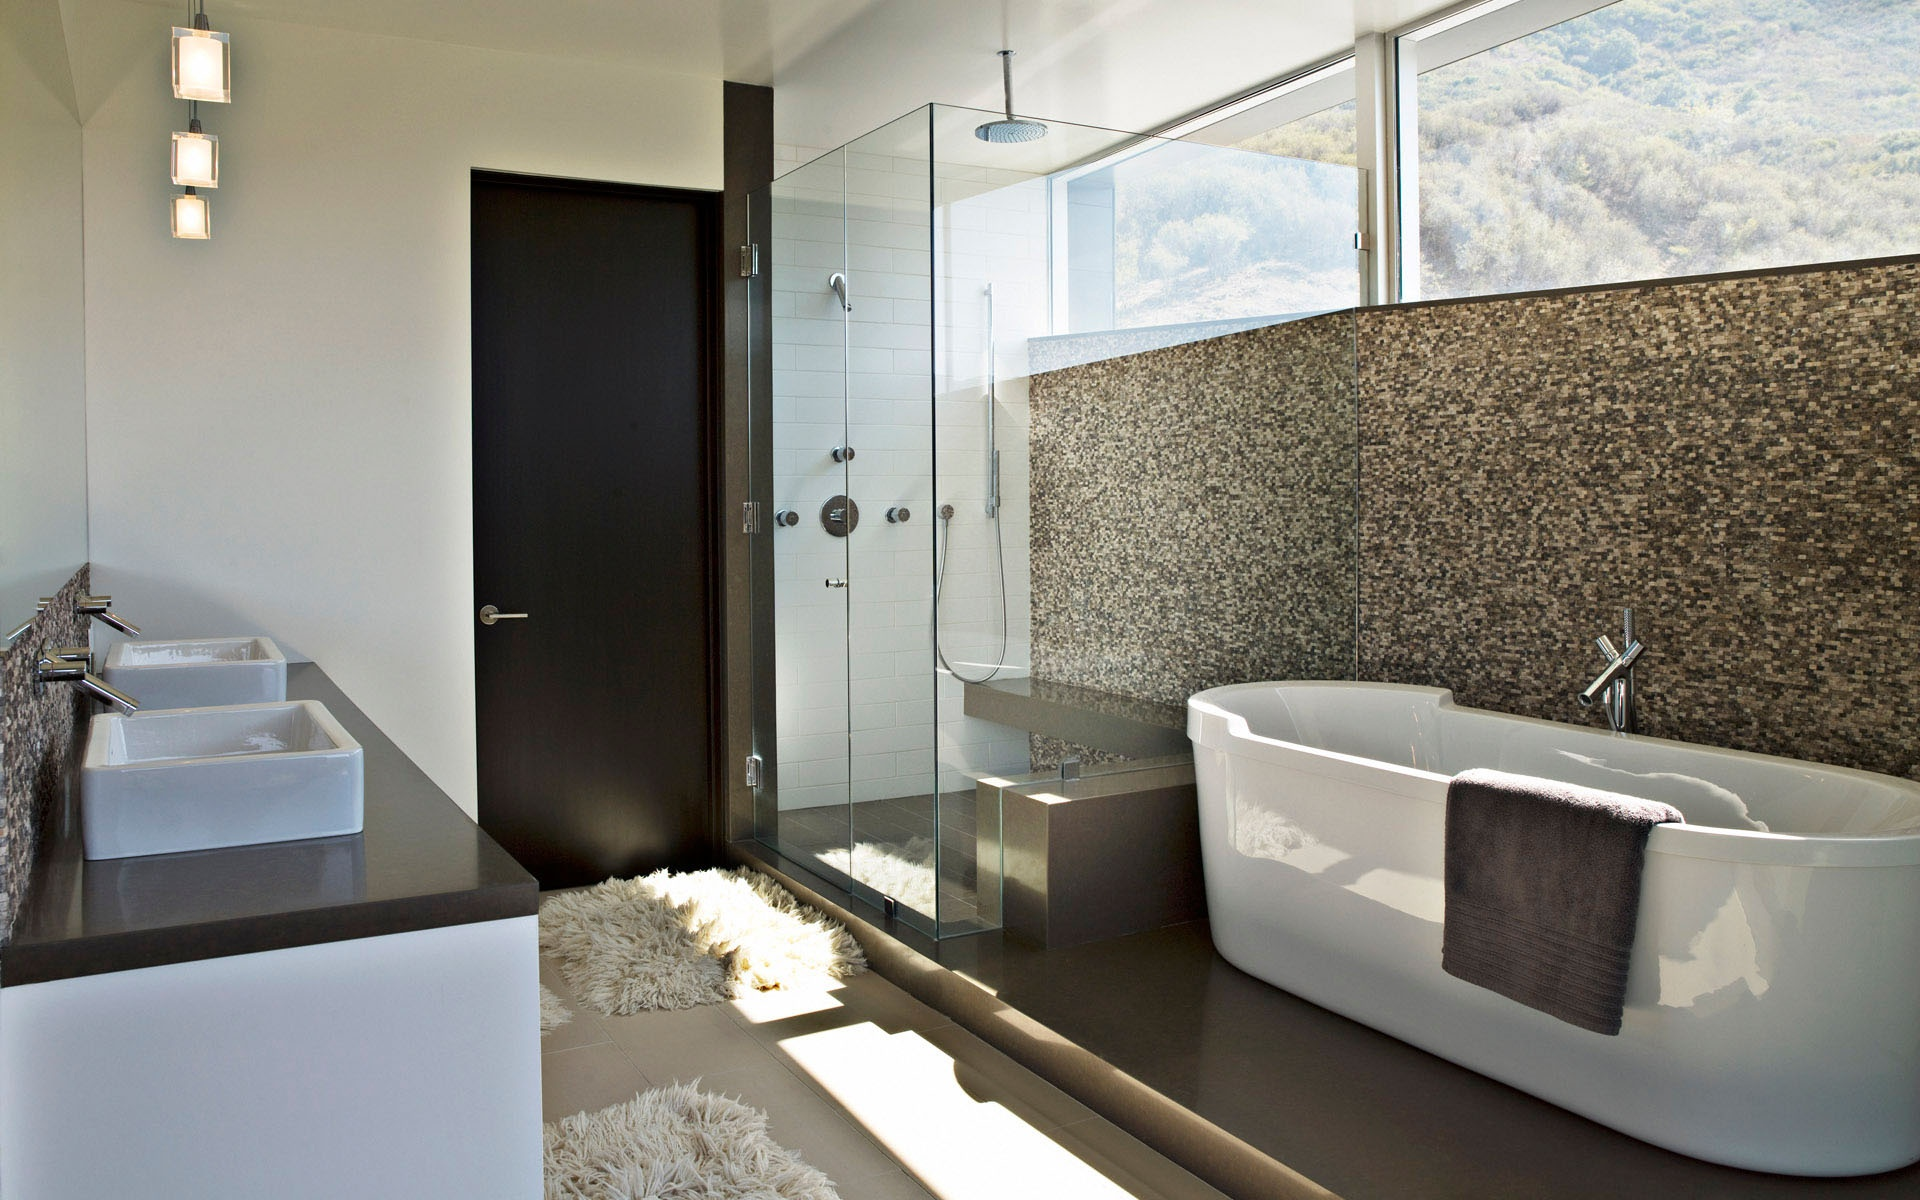 Beautiful Modern Bathroom Wallpaper Design - Bathroom Design With Bath - HD Wallpaper